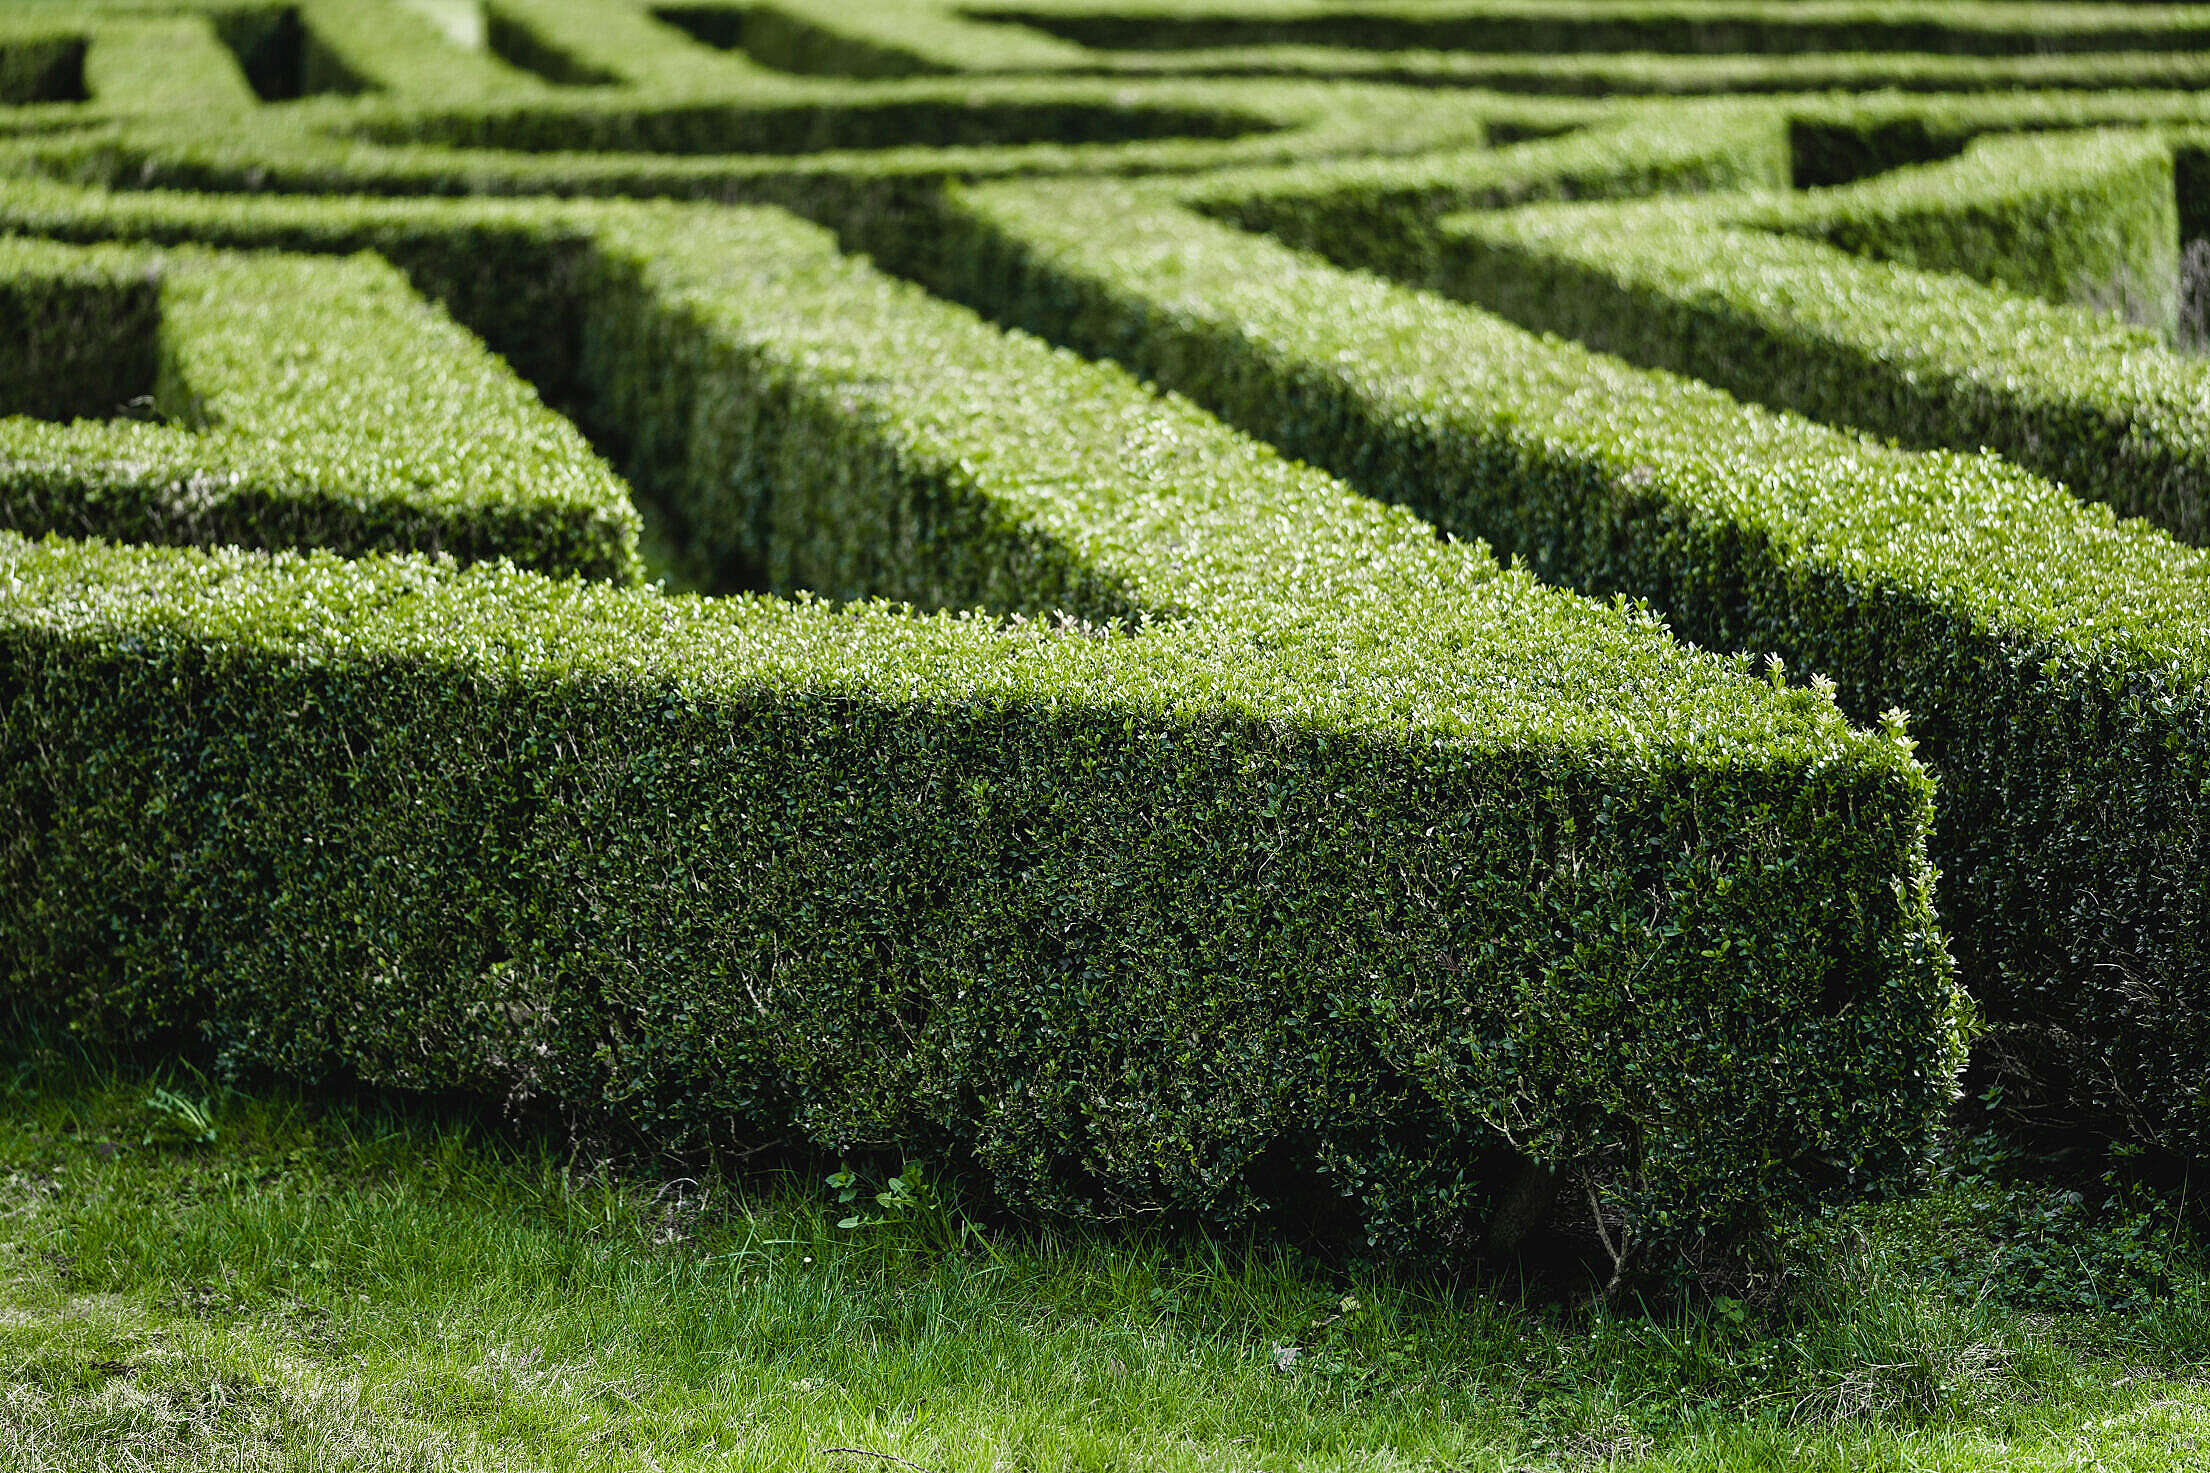 Garden Maze in The Lednice Castle Park Free Stock Photo